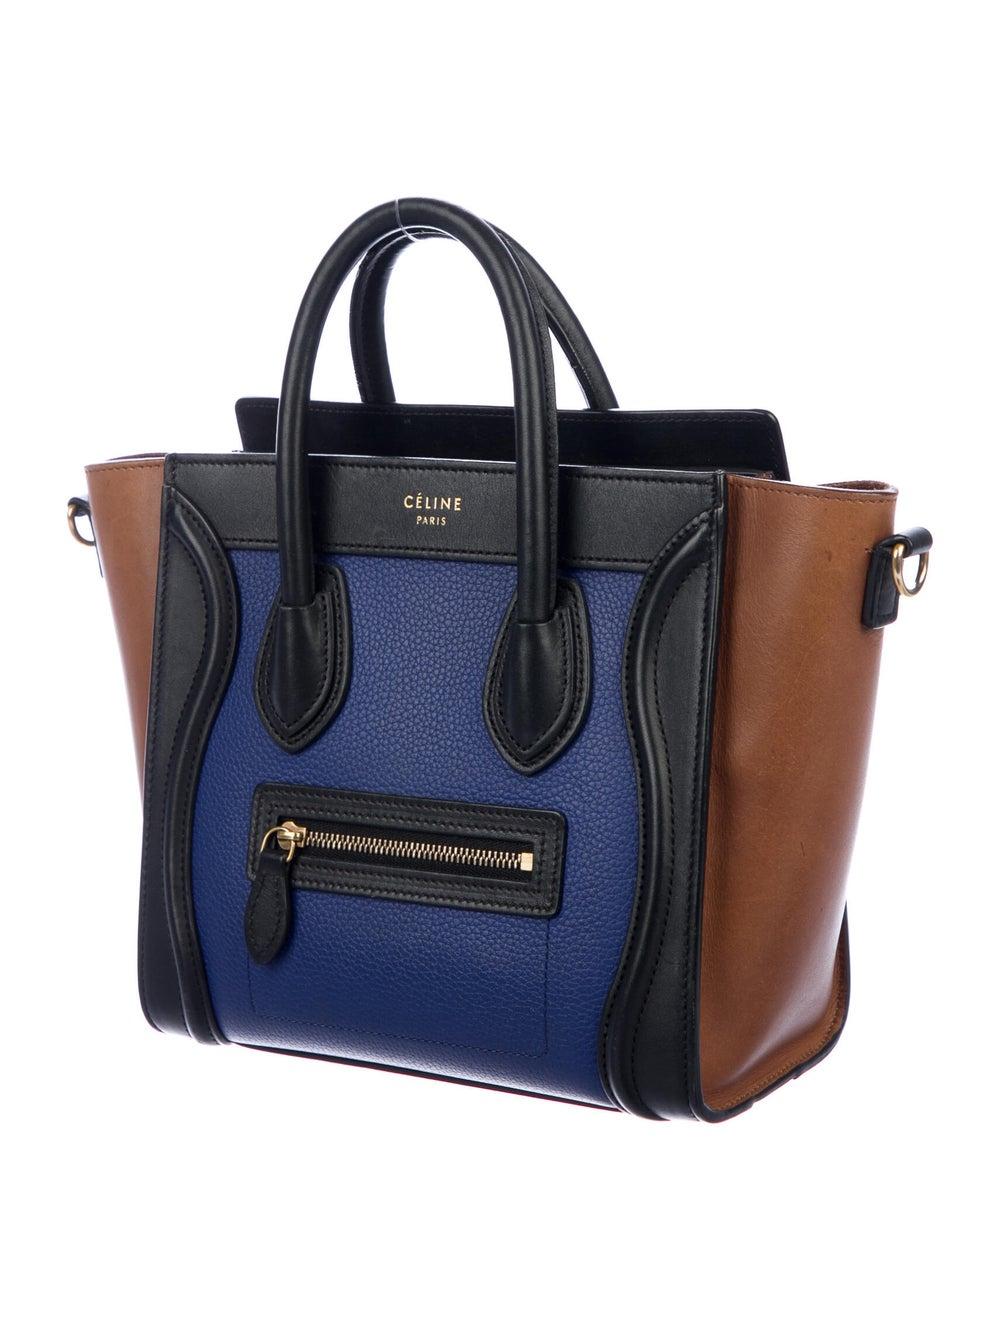 Celine Nano Luggage Tote brass - image 3